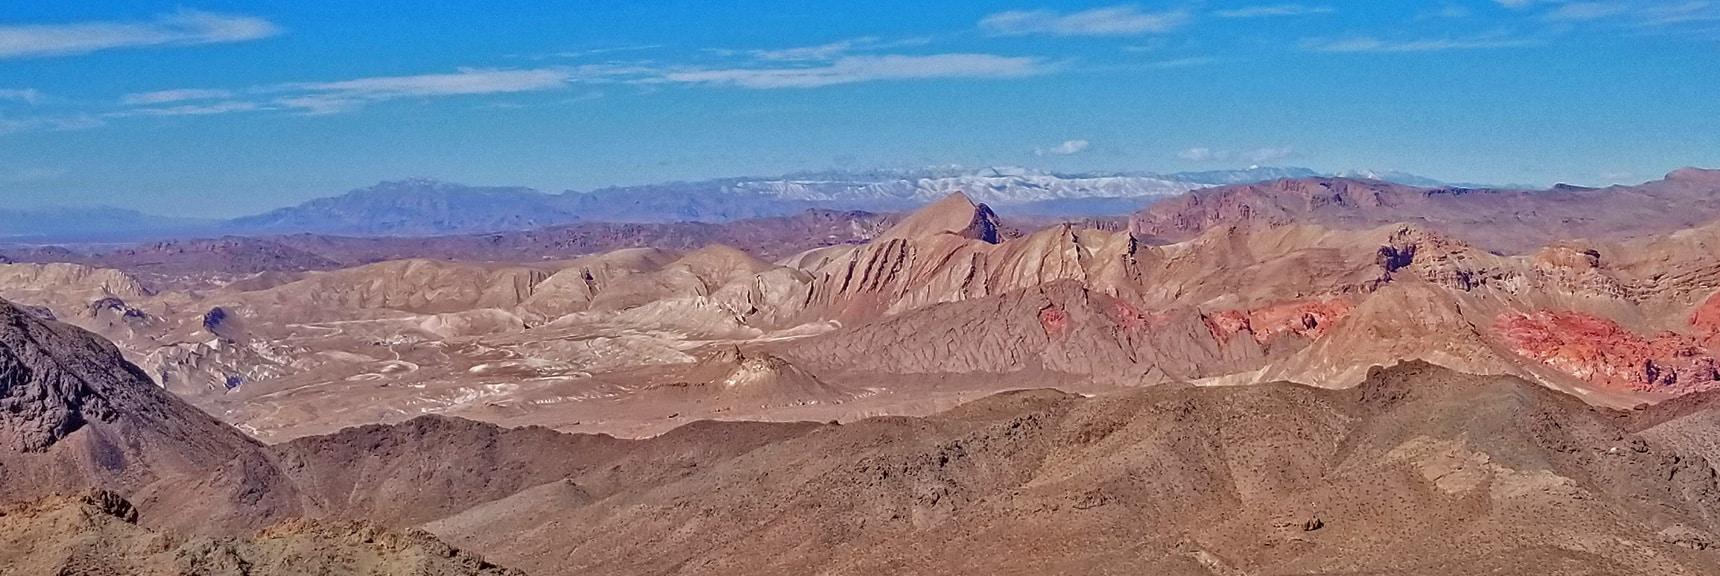 Gass Peak and the Sheep Range Far Distance | Hamblin Mountain, Lake Mead National Conservation Area, Nevada